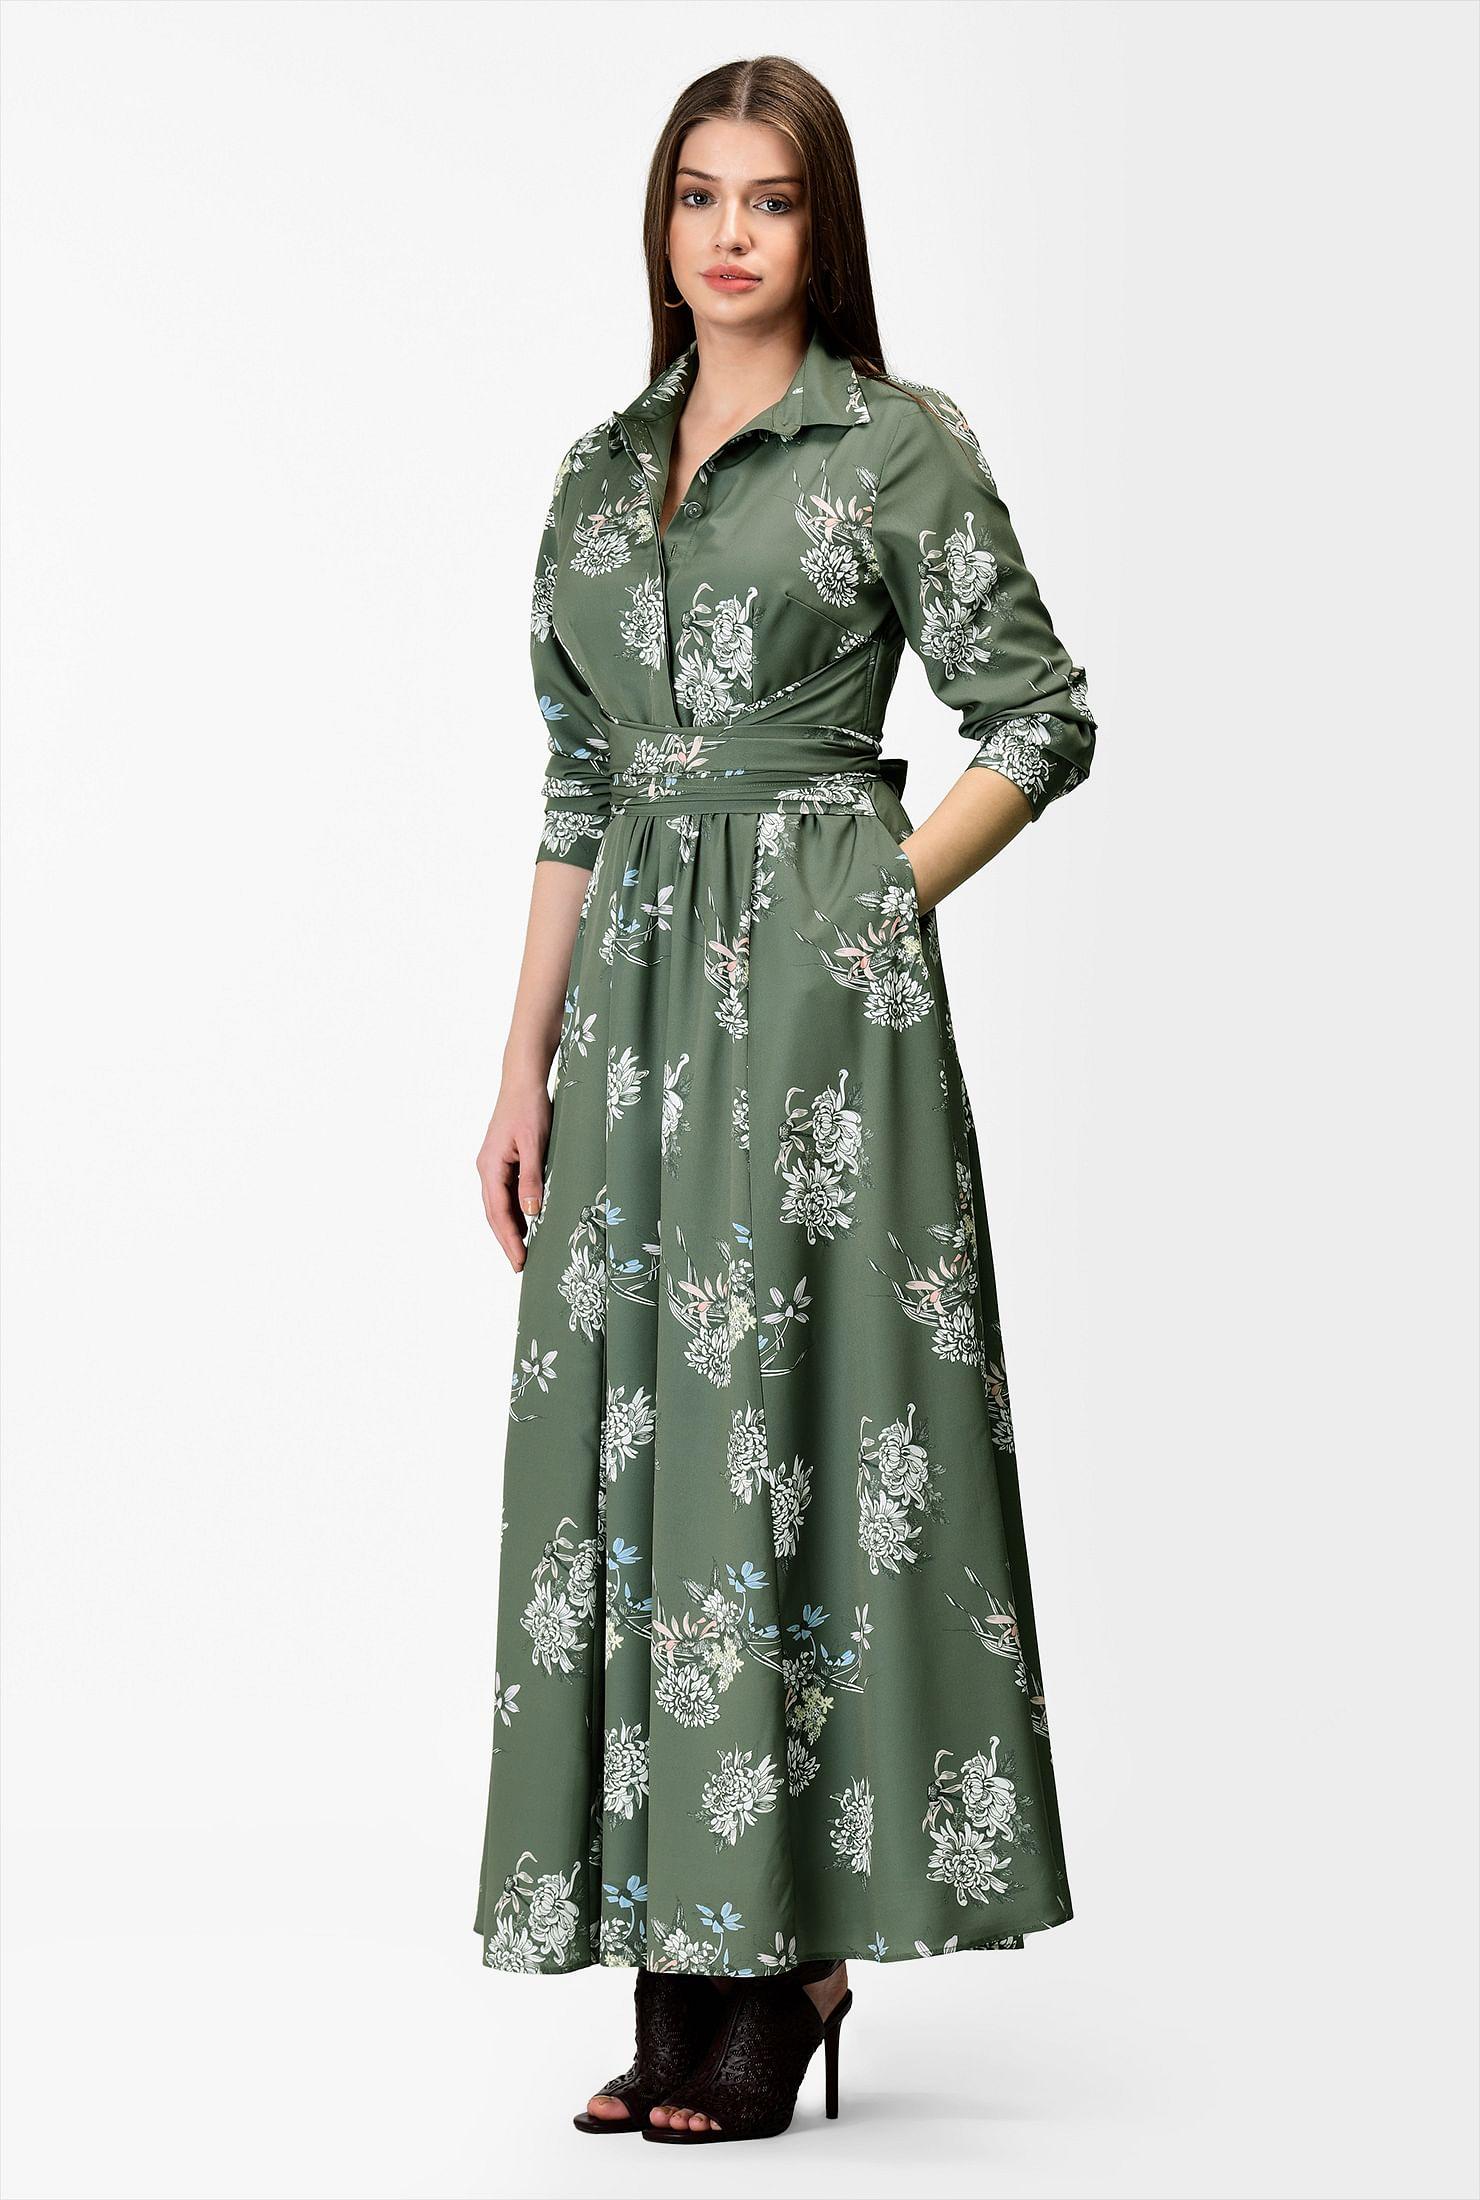 Wonderbaarlijk Floral print cross pleat waist maxi shirtdress - Women's Clothing RB-29